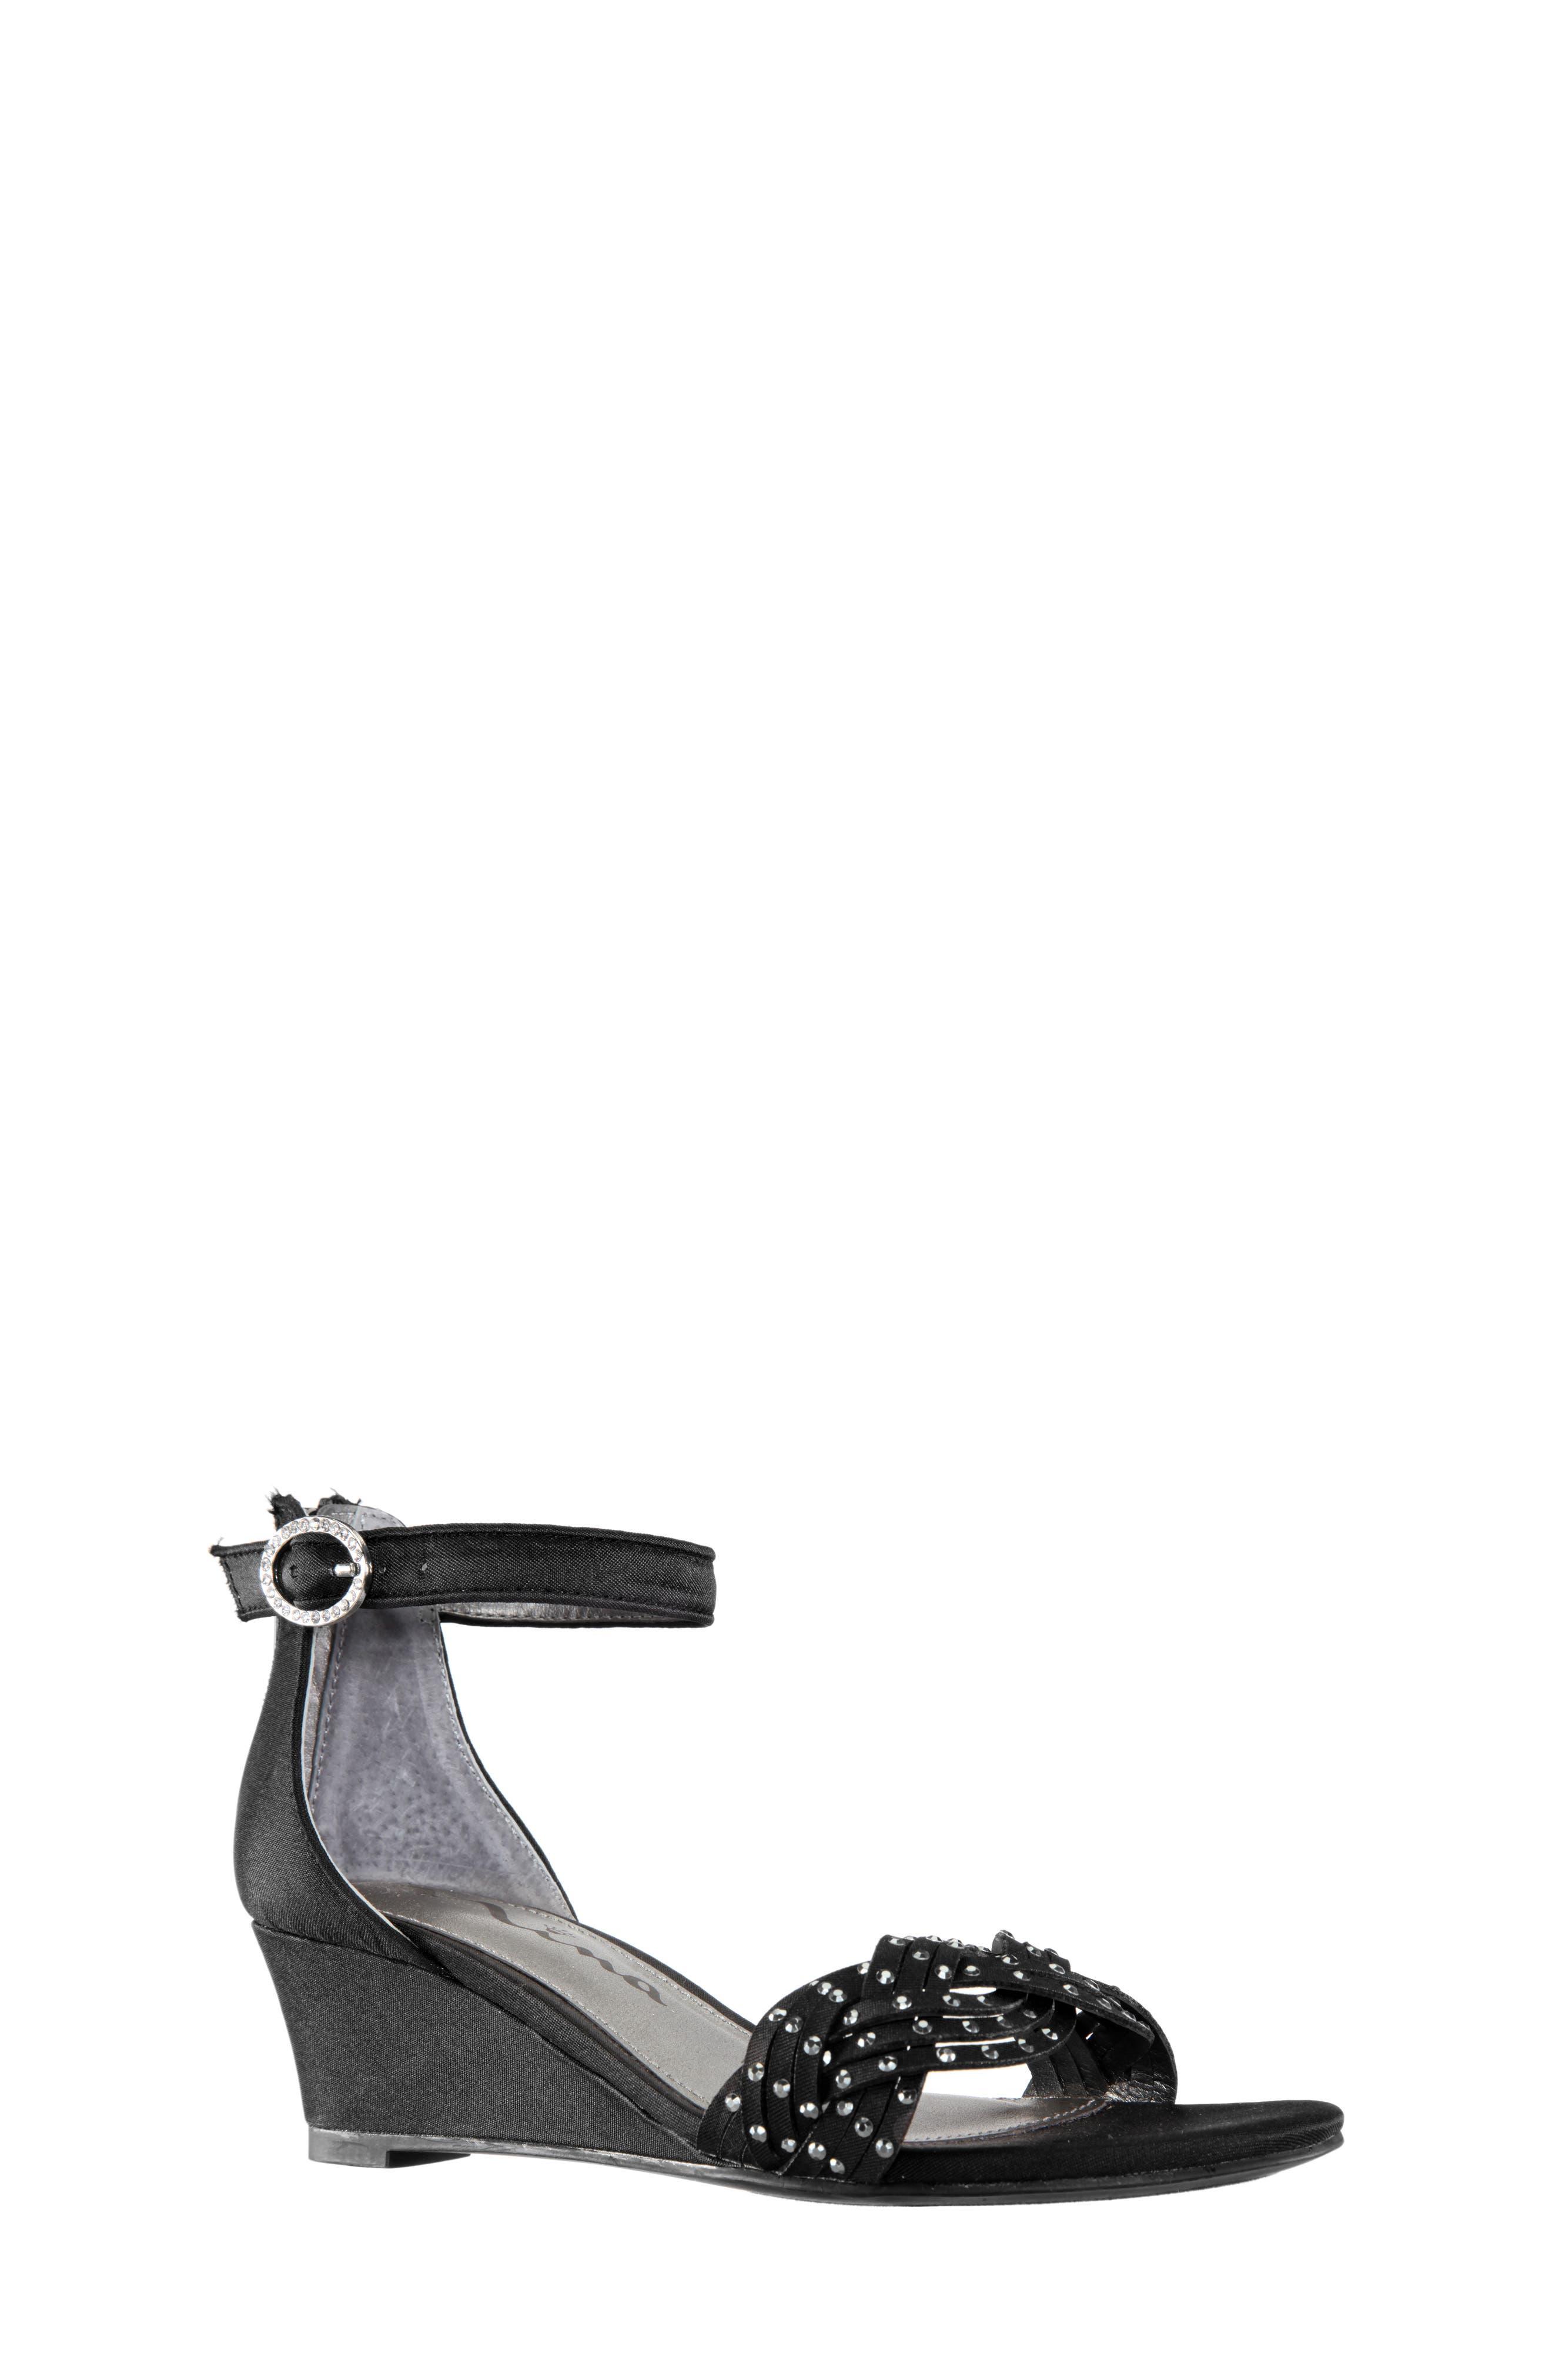 Girls Nina Marlean Wedge Sandal Size 2 M  Black